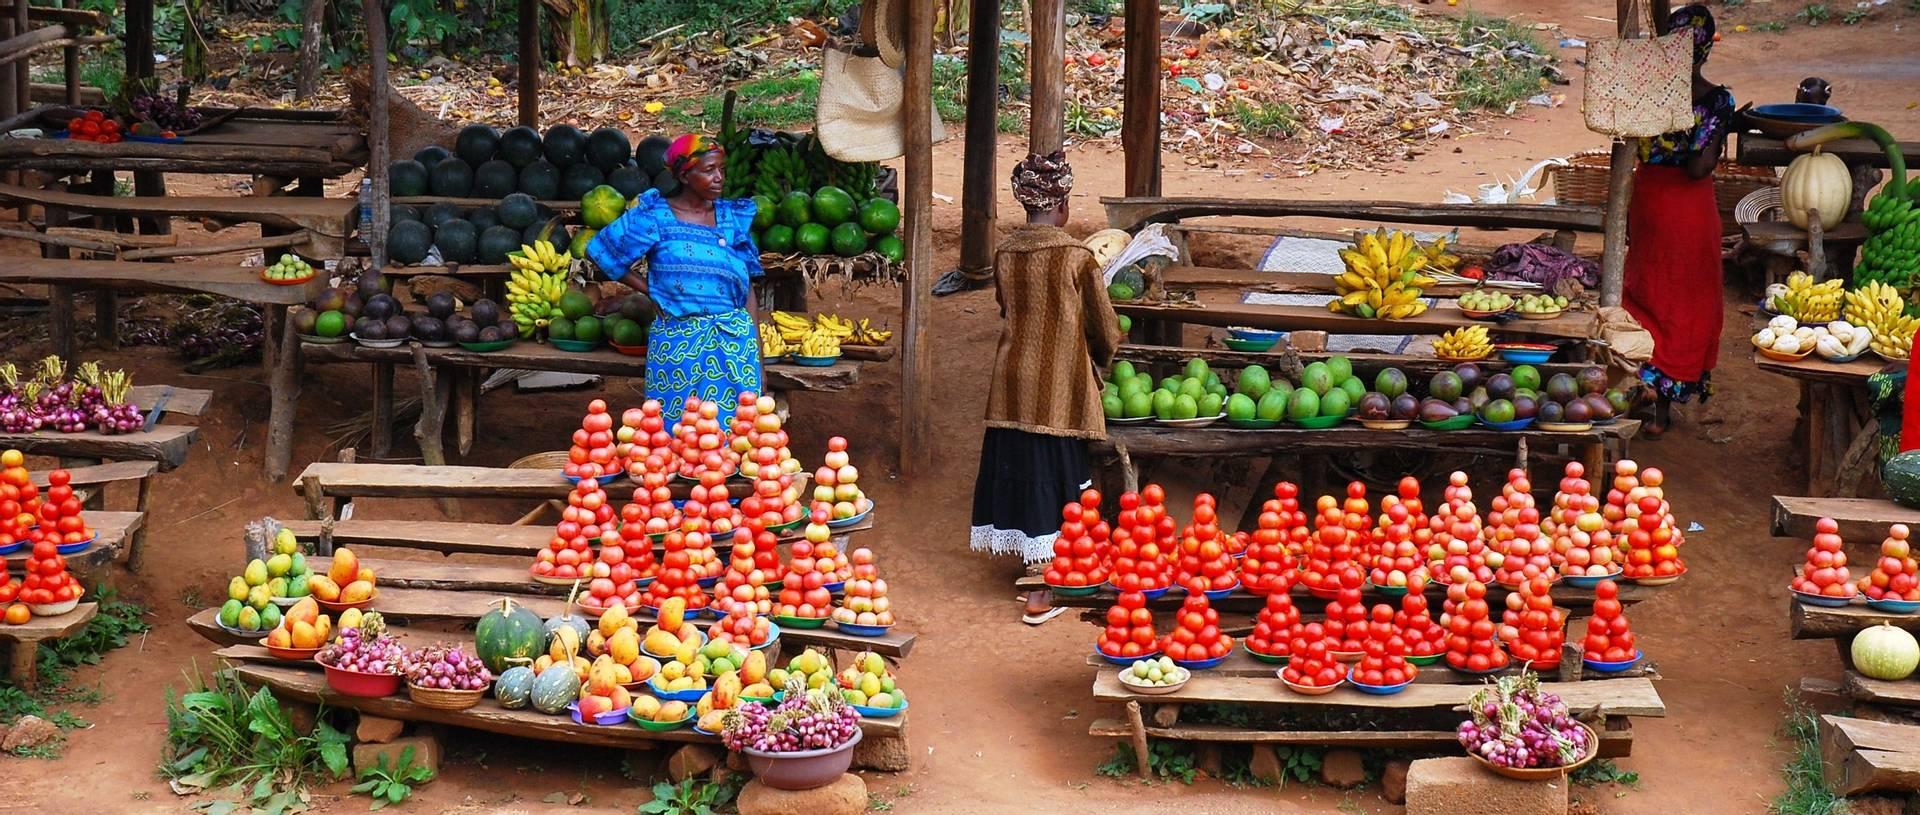 Roadside Stalls, Uganda